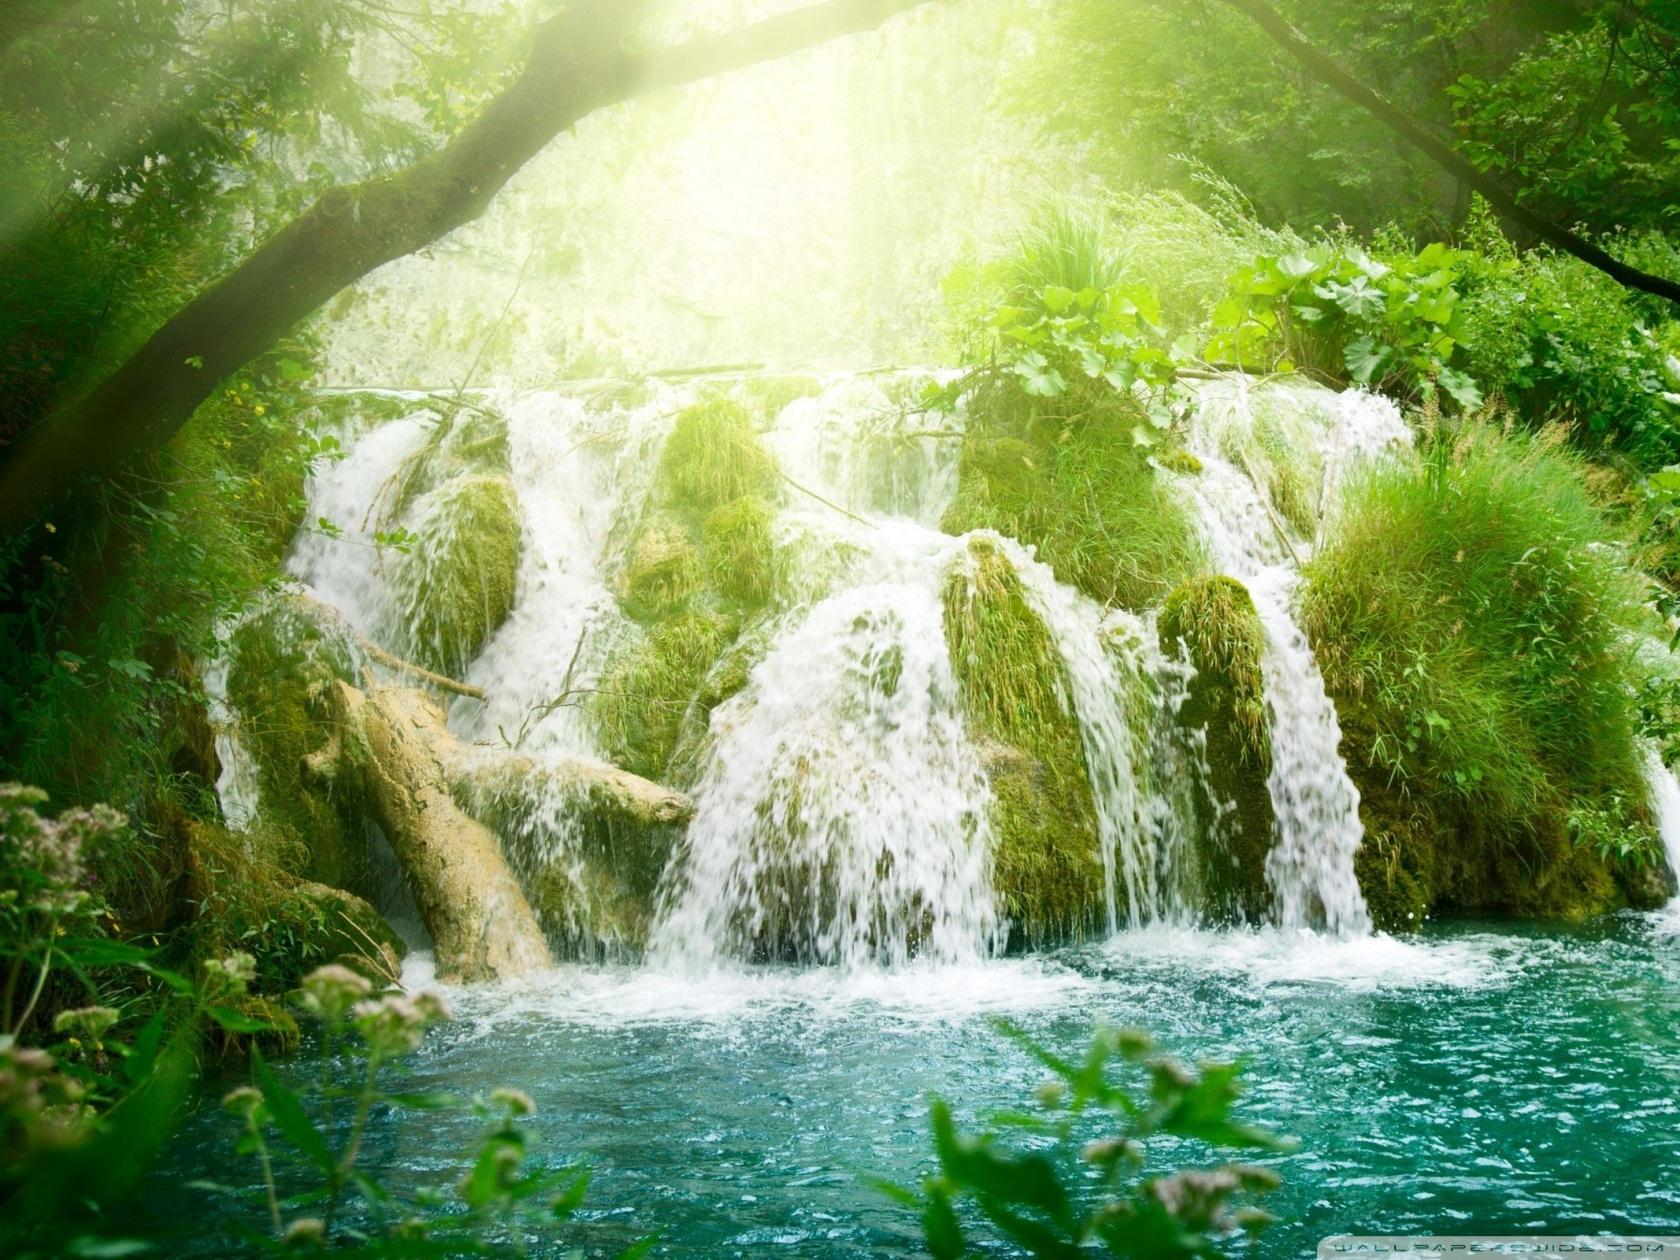 Waterfalls Wallpaper Gallery - Beautiful Wallpapers Of Waterfalls , HD Wallpaper & Backgrounds